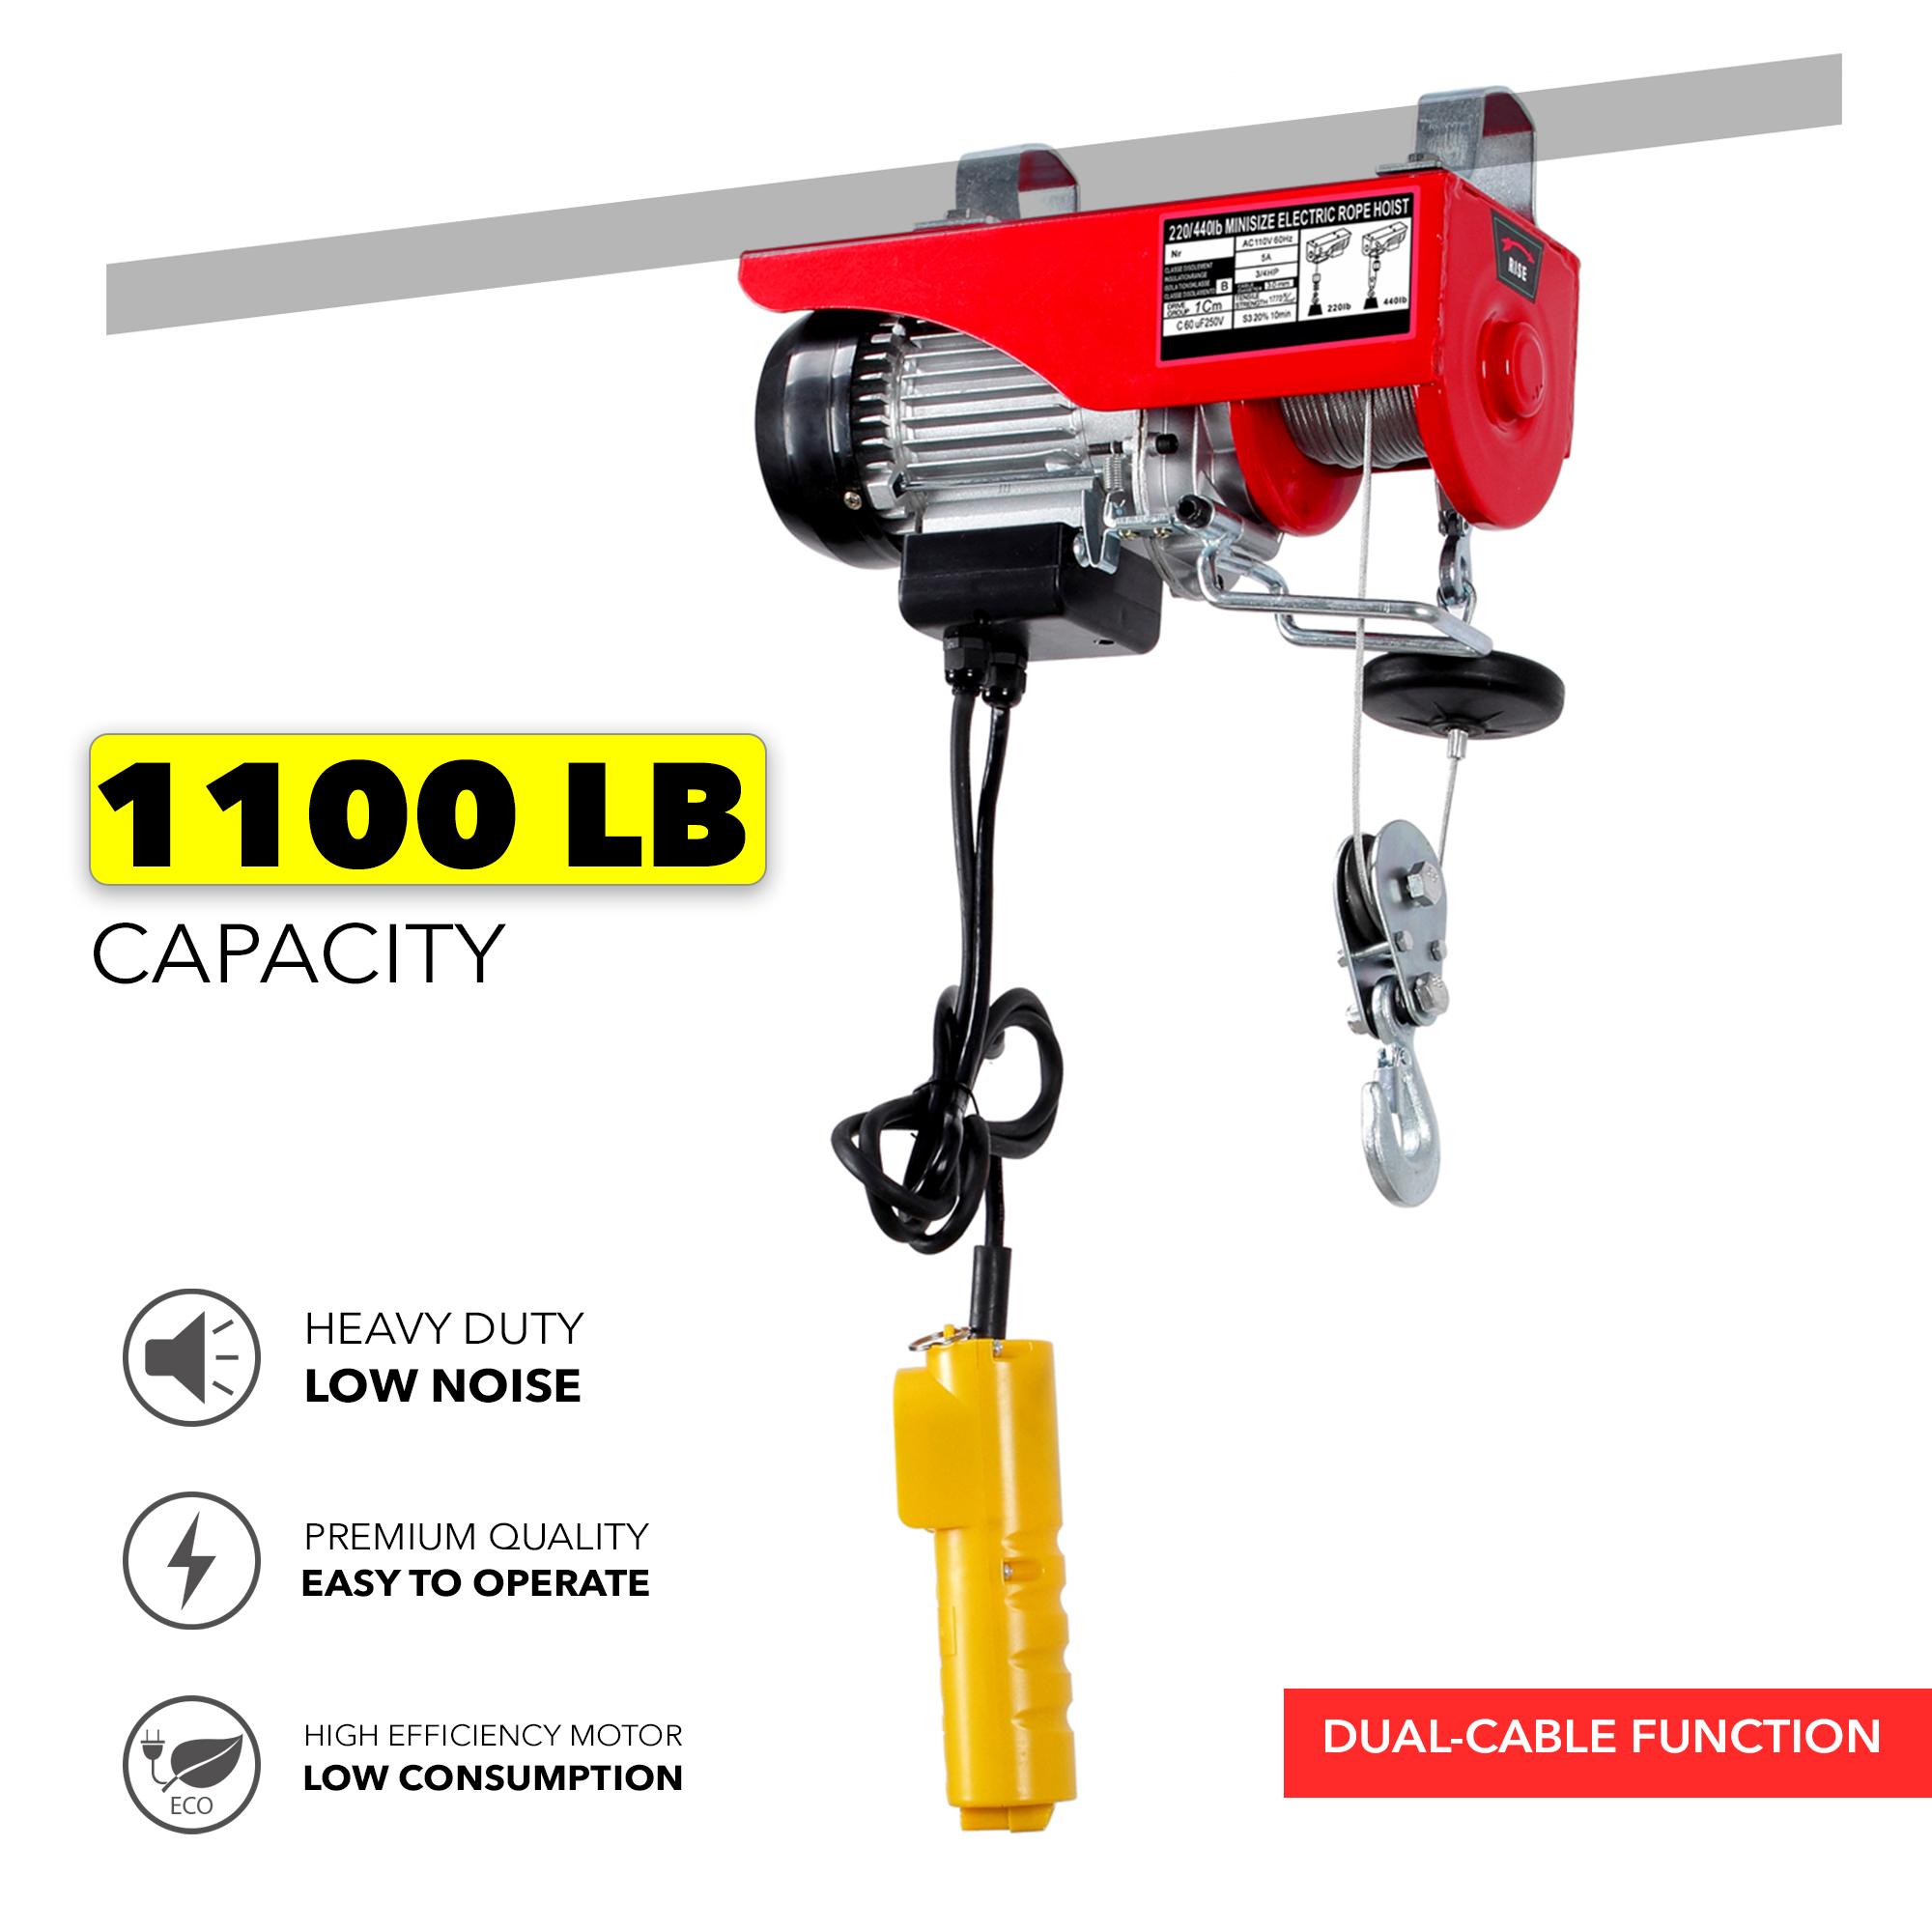 Hard-Working New 880lbs Mini Electric Hoist Crane Overhead Garage Winch Remote Control Auto Lift Lifting Tools & Accessories